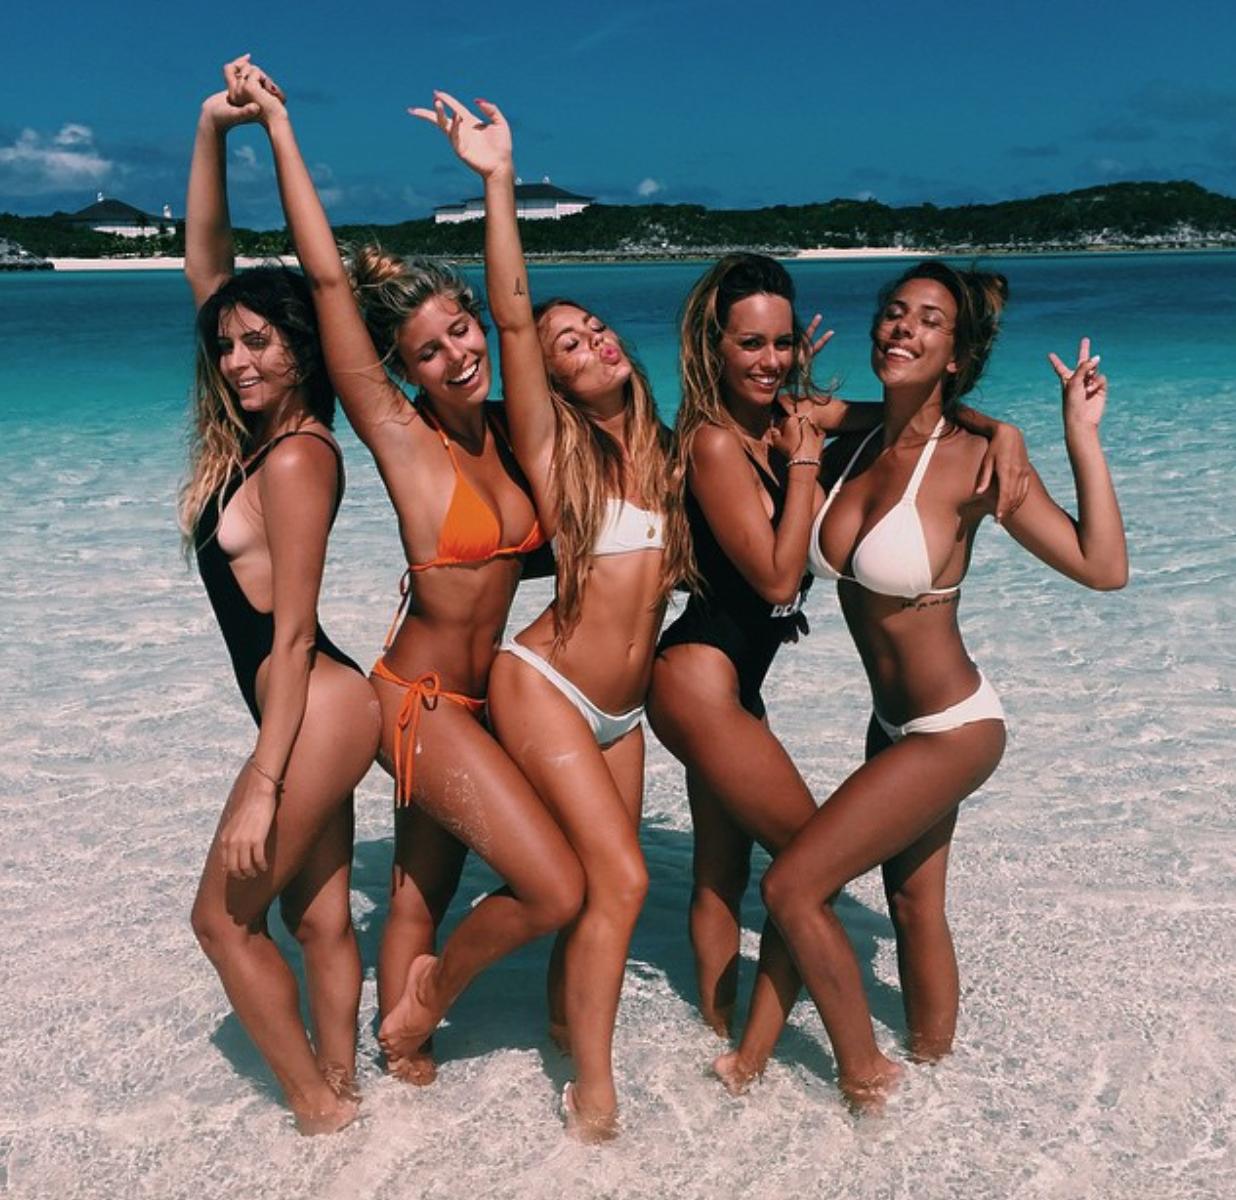 bahamas babes